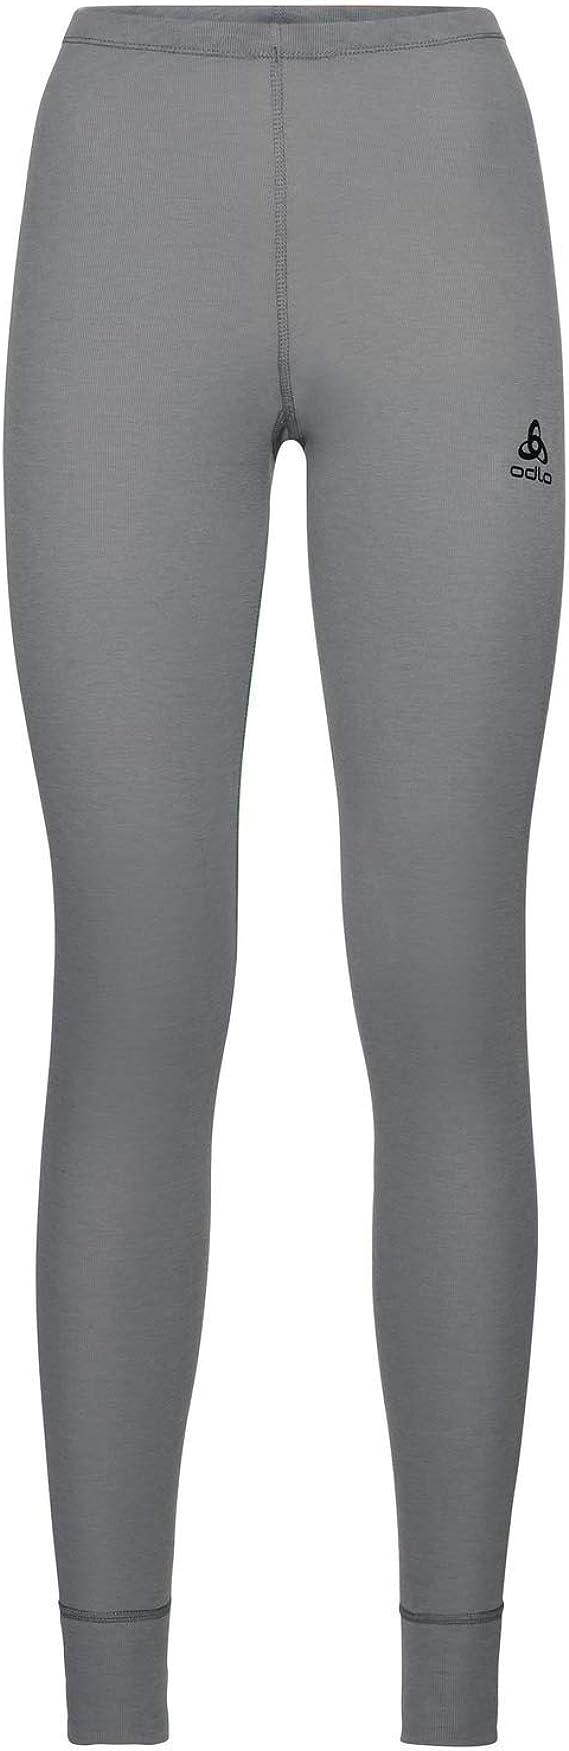 ODLO Set Warm God Jul Womens Concrete Grey 192071 RRP 99,99